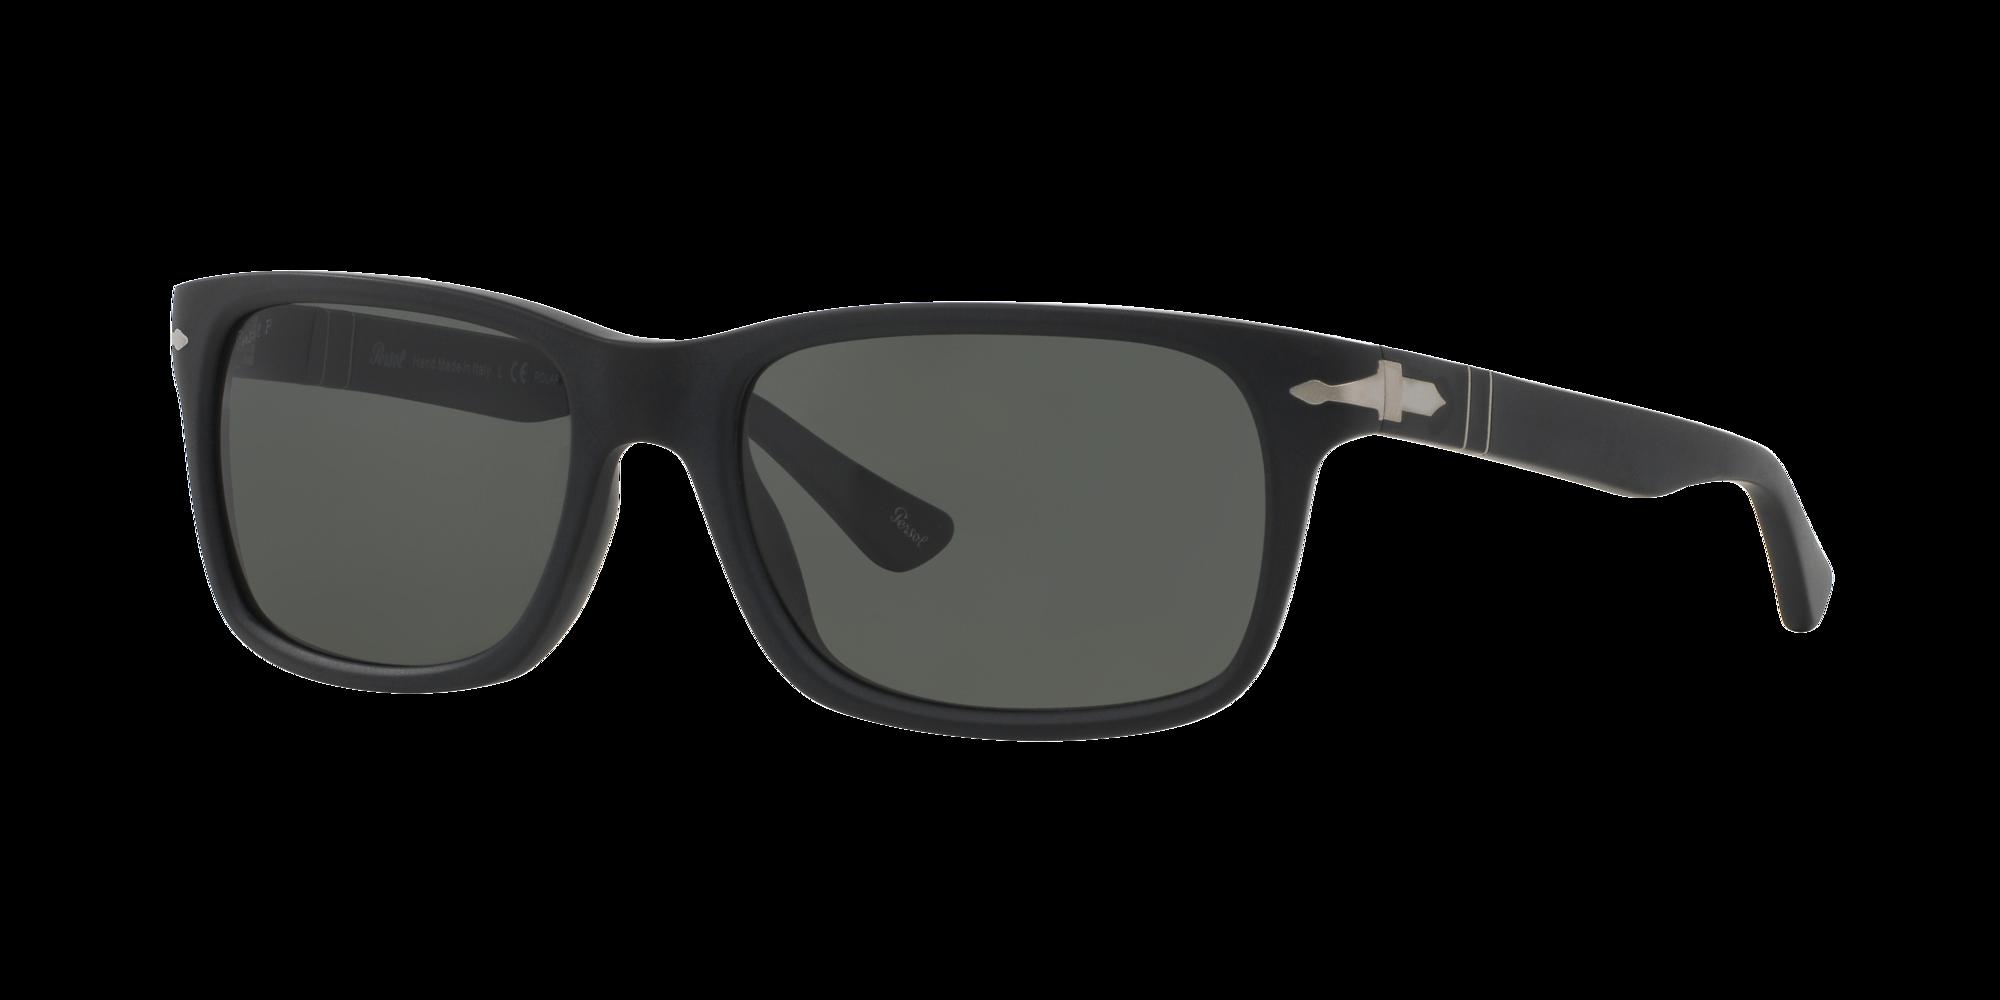 Persol PO3048S Black Frame Sunglasses with Grey-Black Lenses